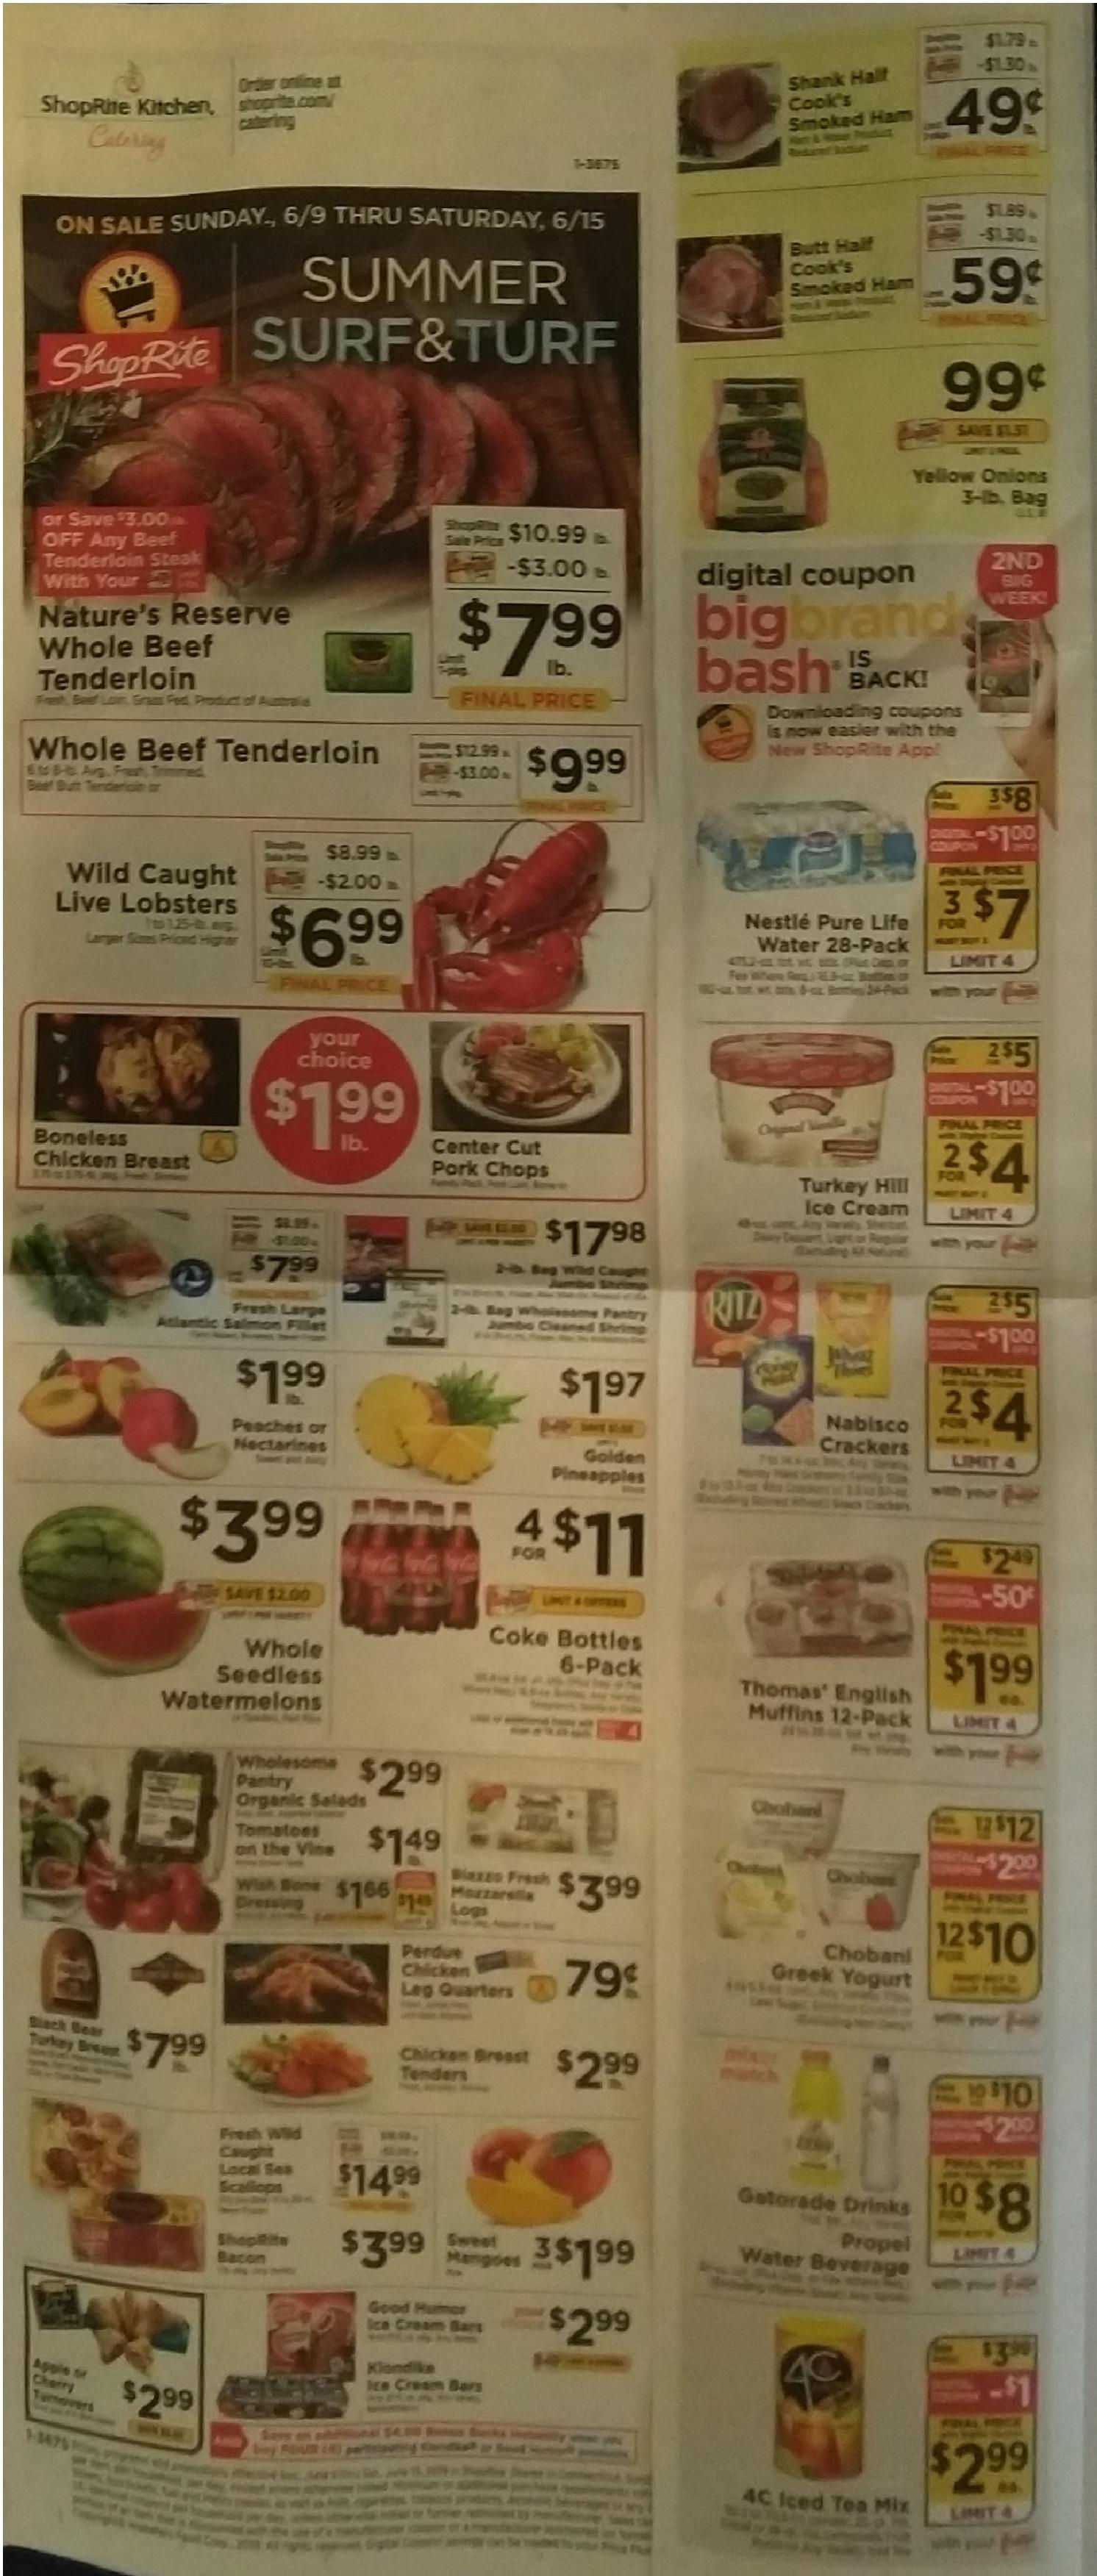 shoprite deals 9/6/15